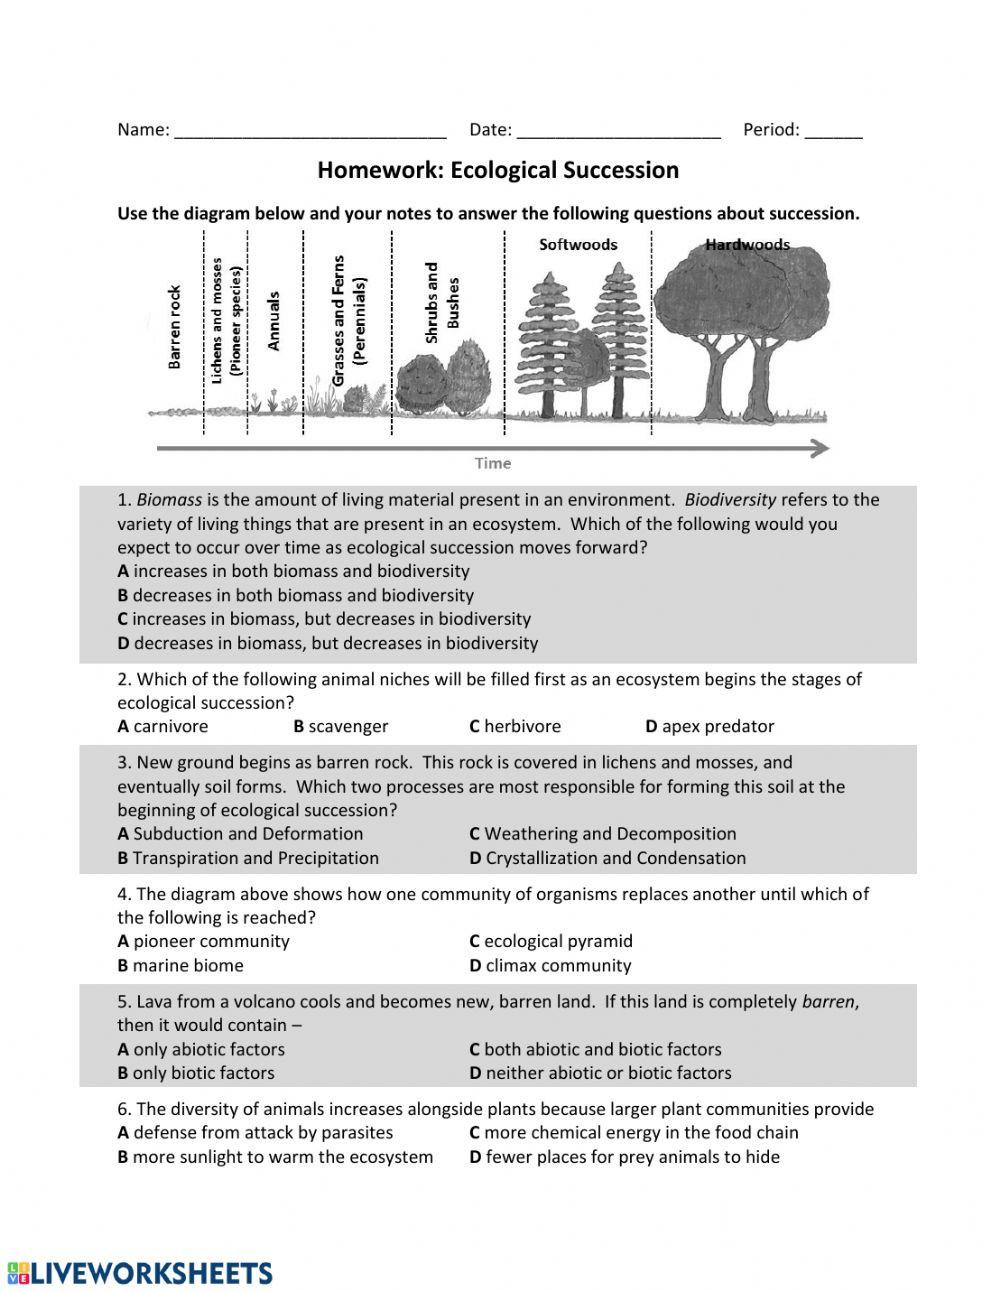 ES Ecological Succession HW Interactive worksheet